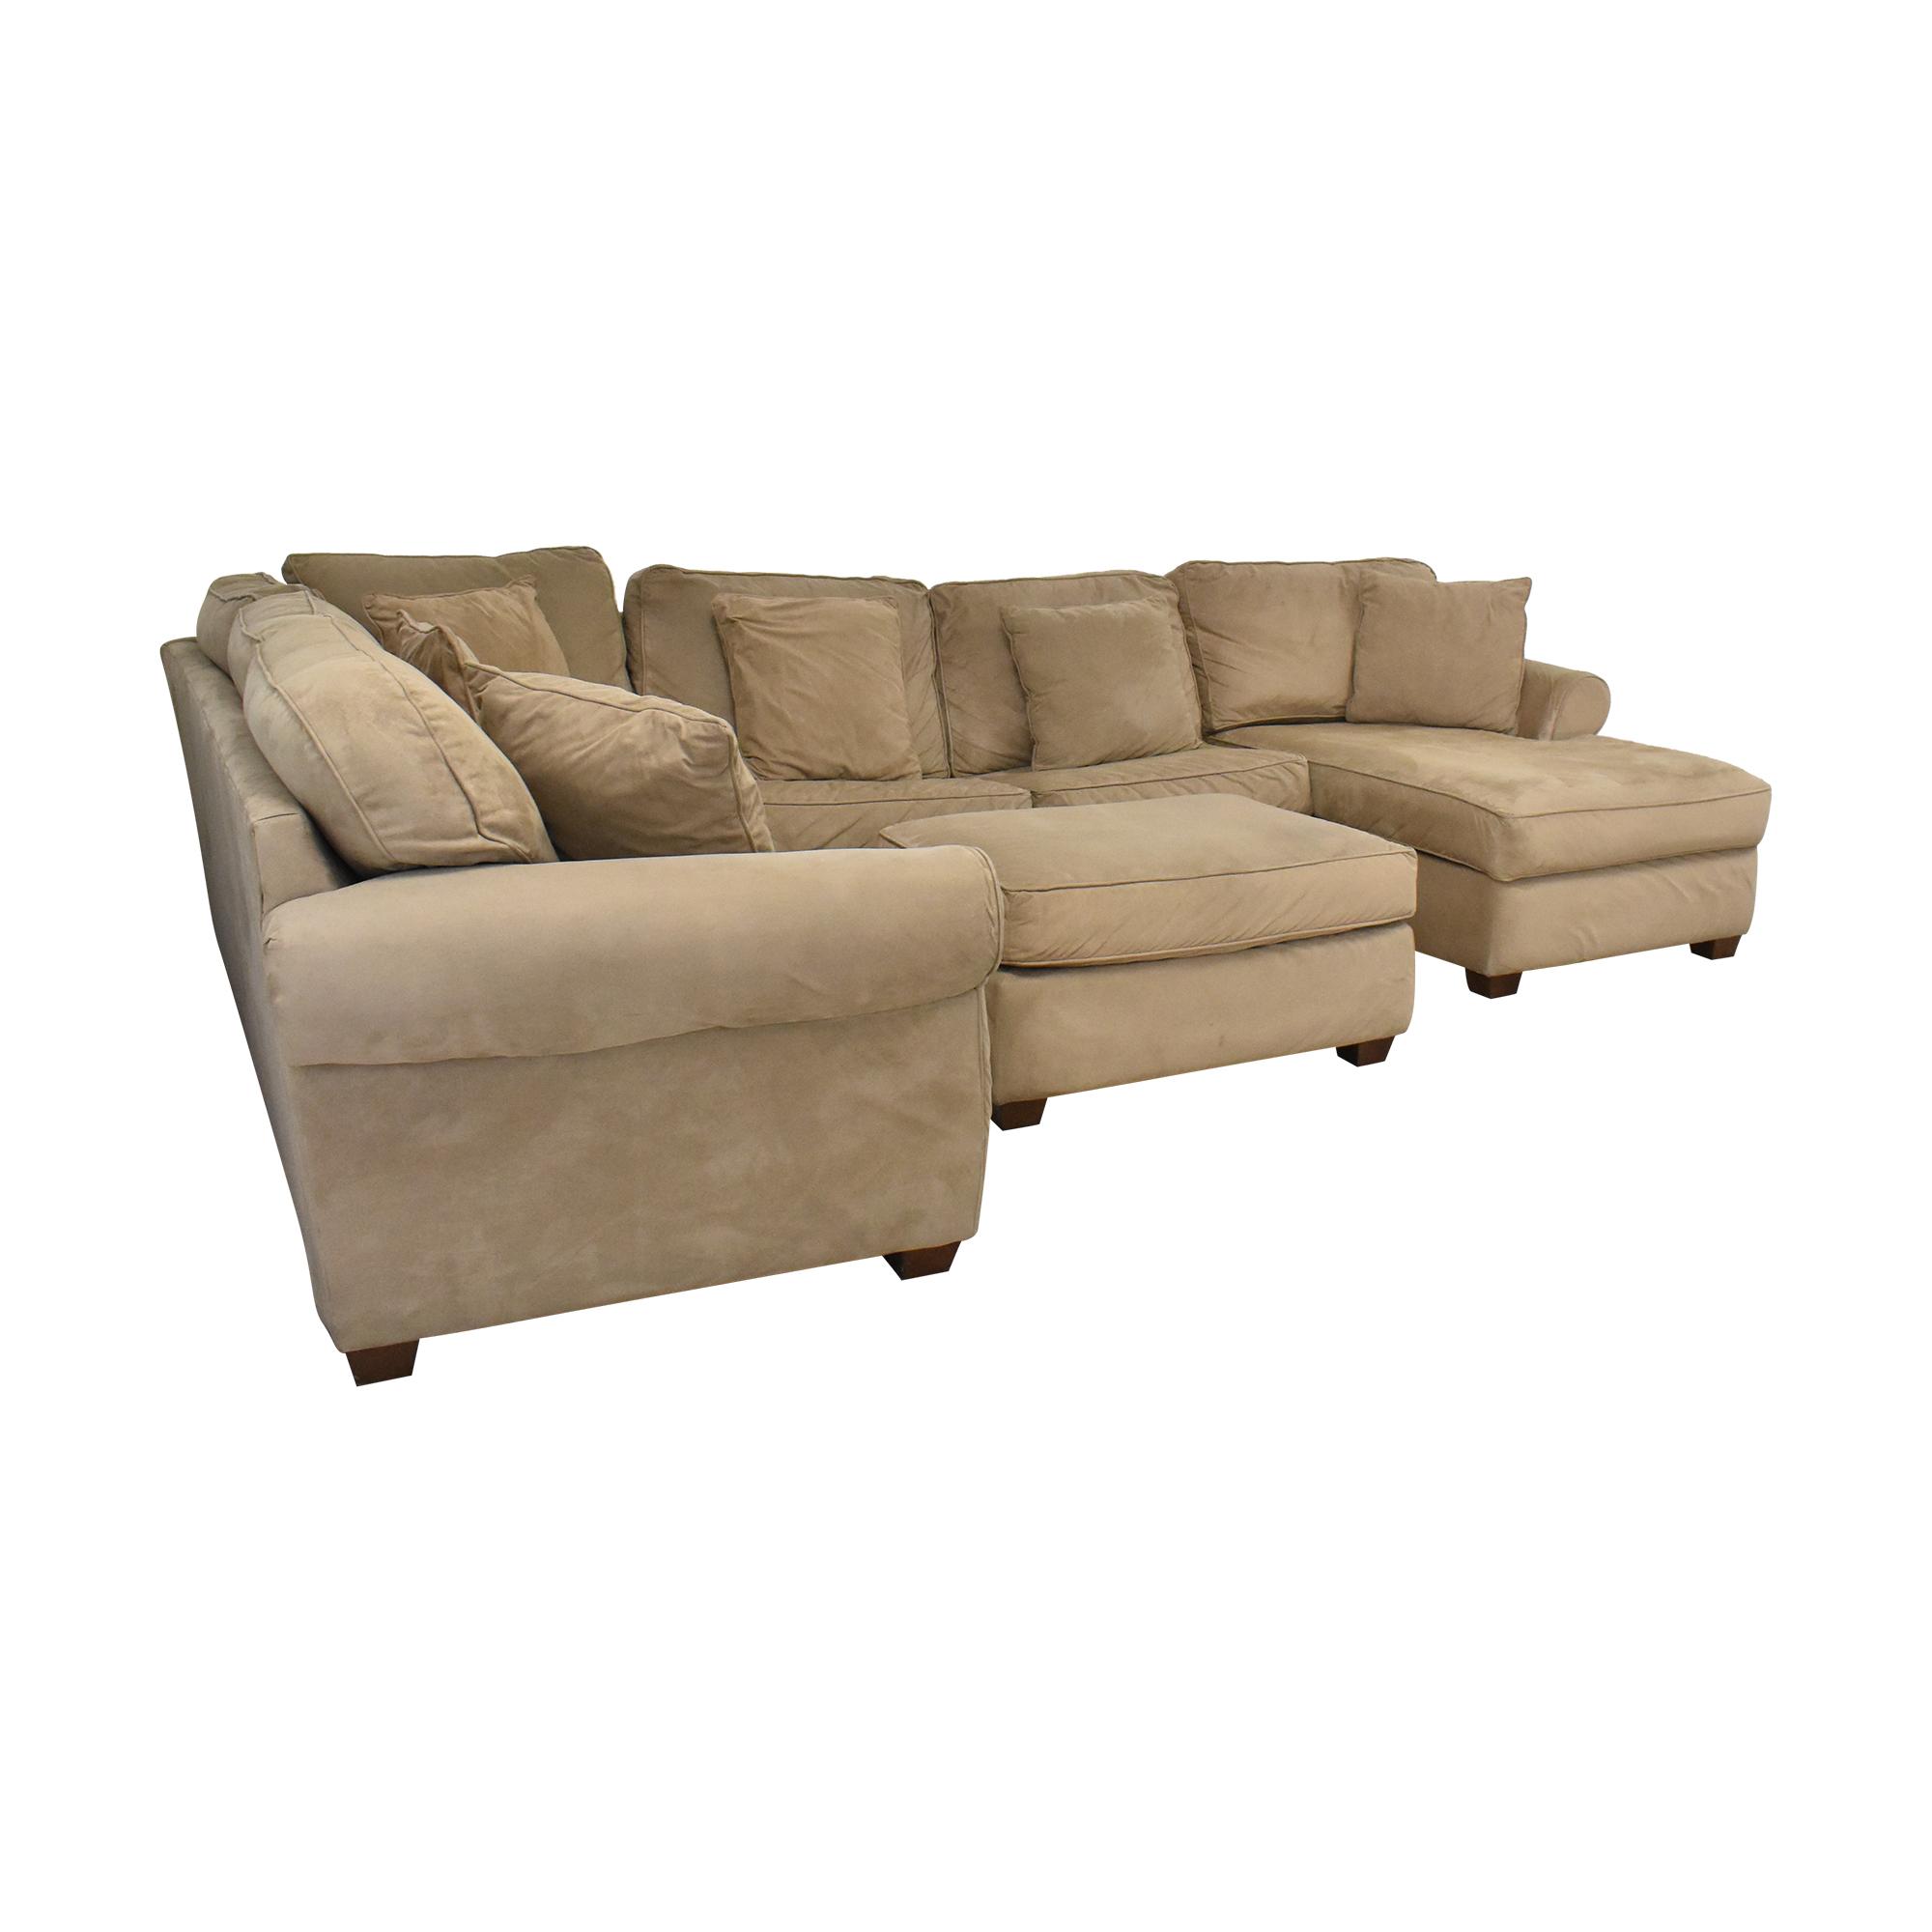 Macy's Macy's Chaise Sectional Sleeper Sofa with Ottoman light brown